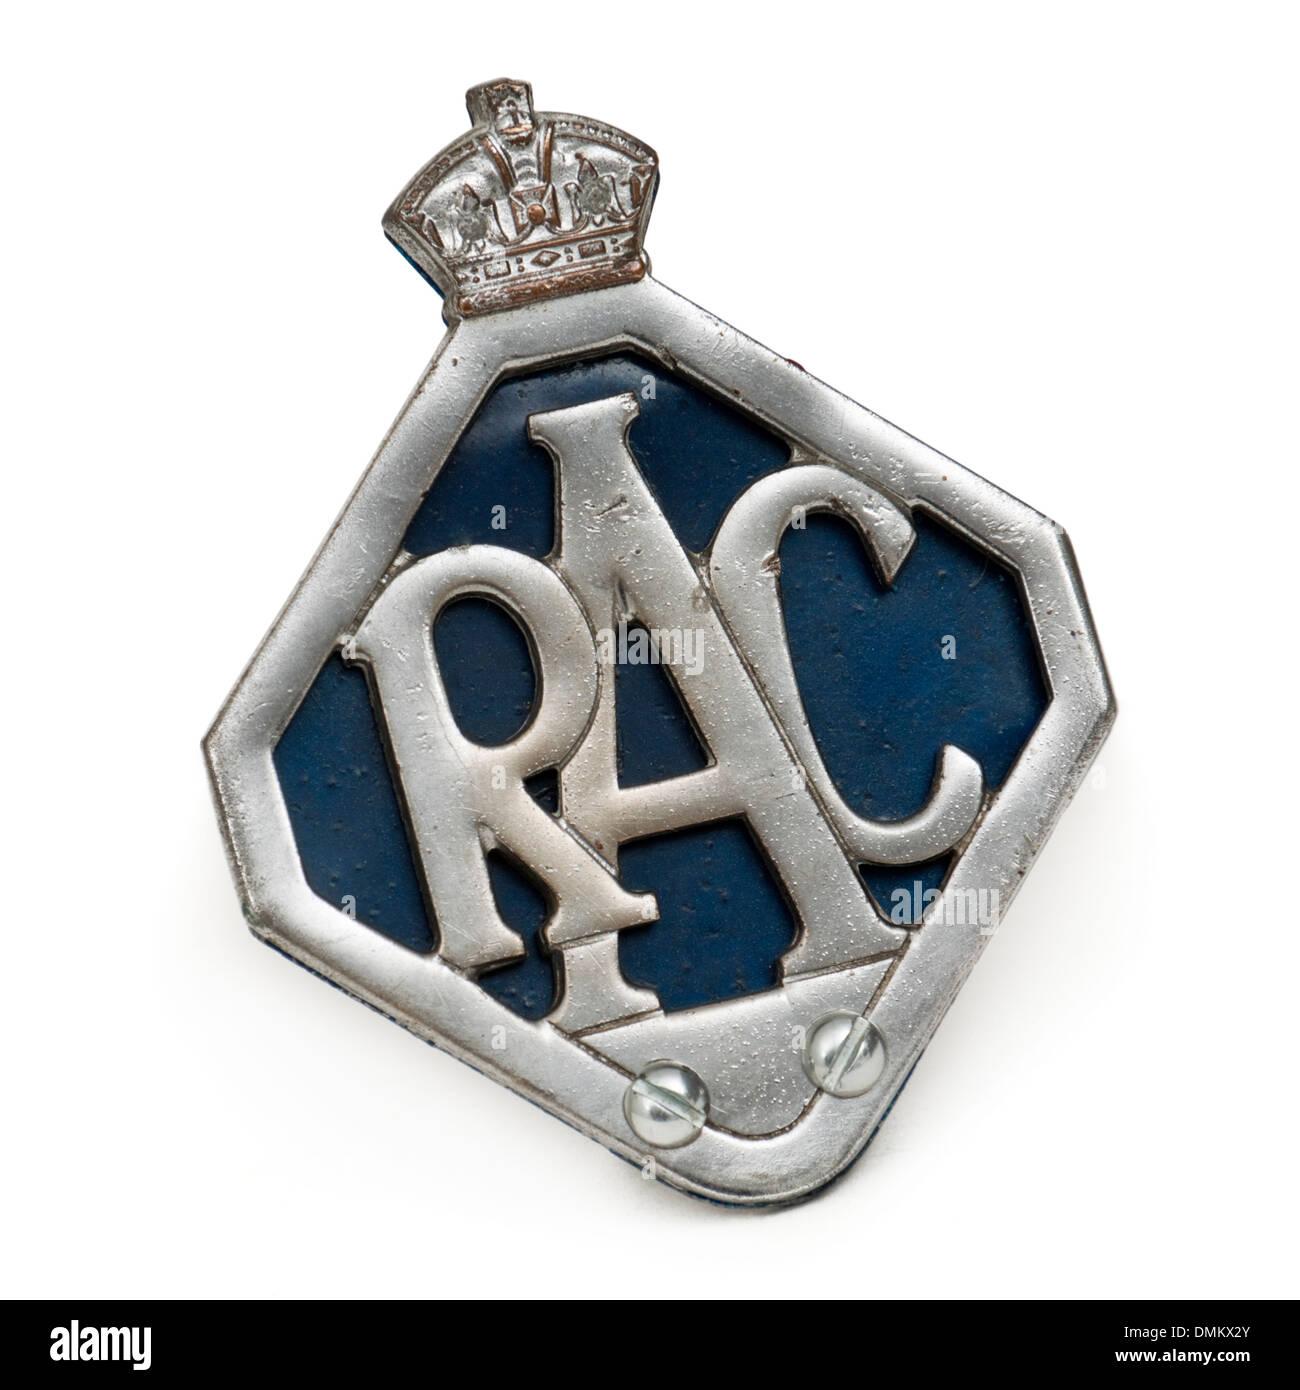 rac badge dating